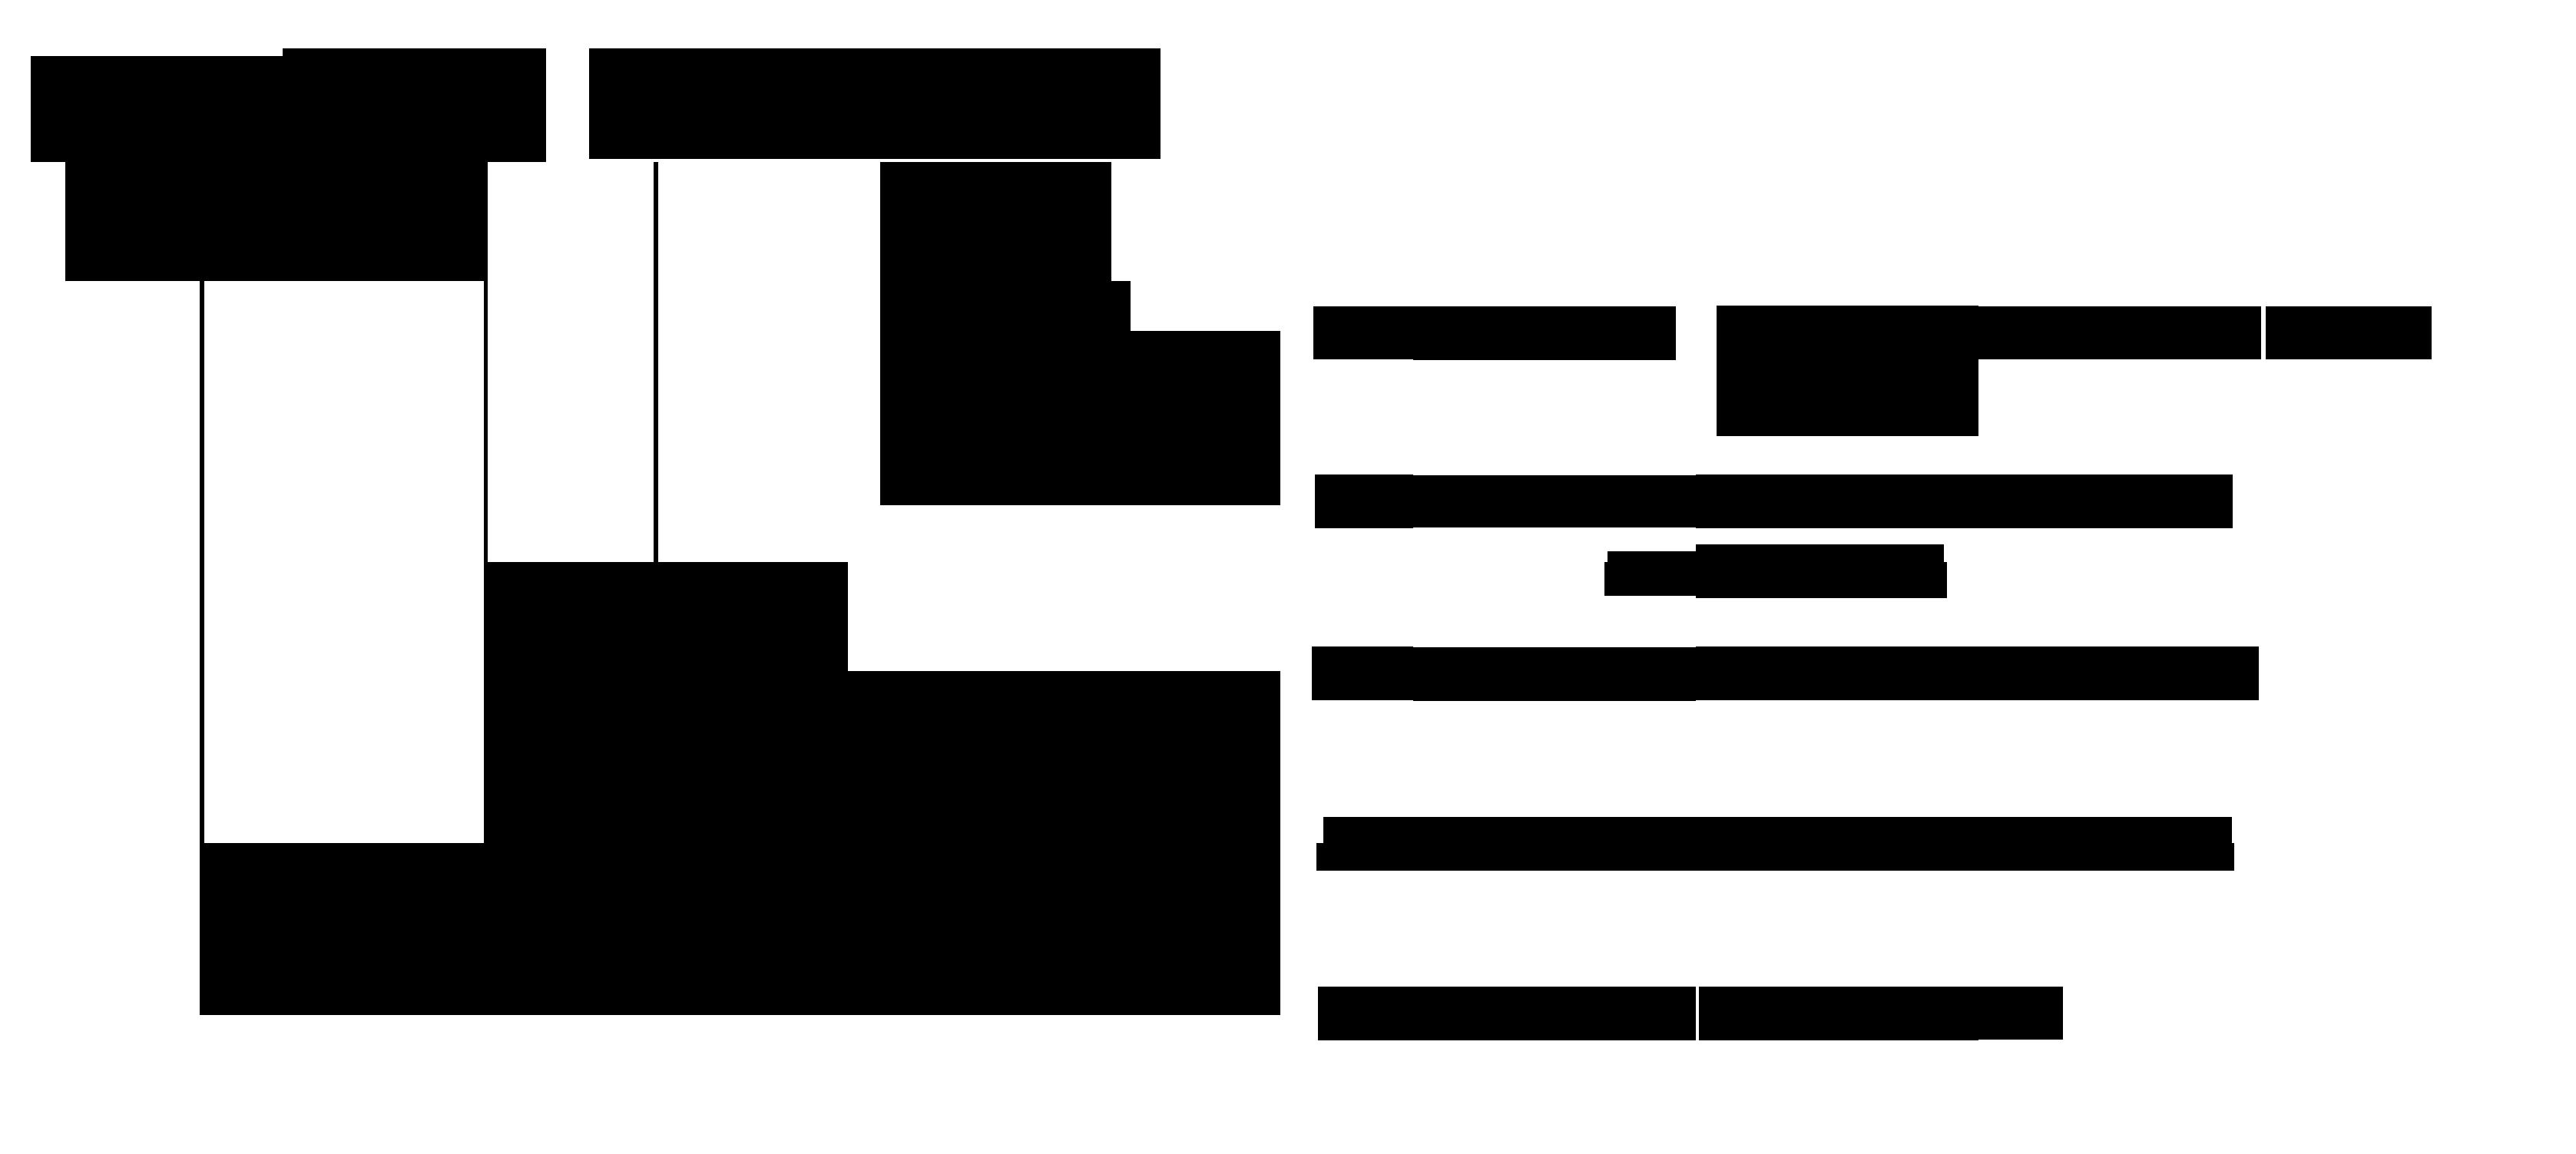 YDS-35B-80 TC运输专用铝合金液氮罐